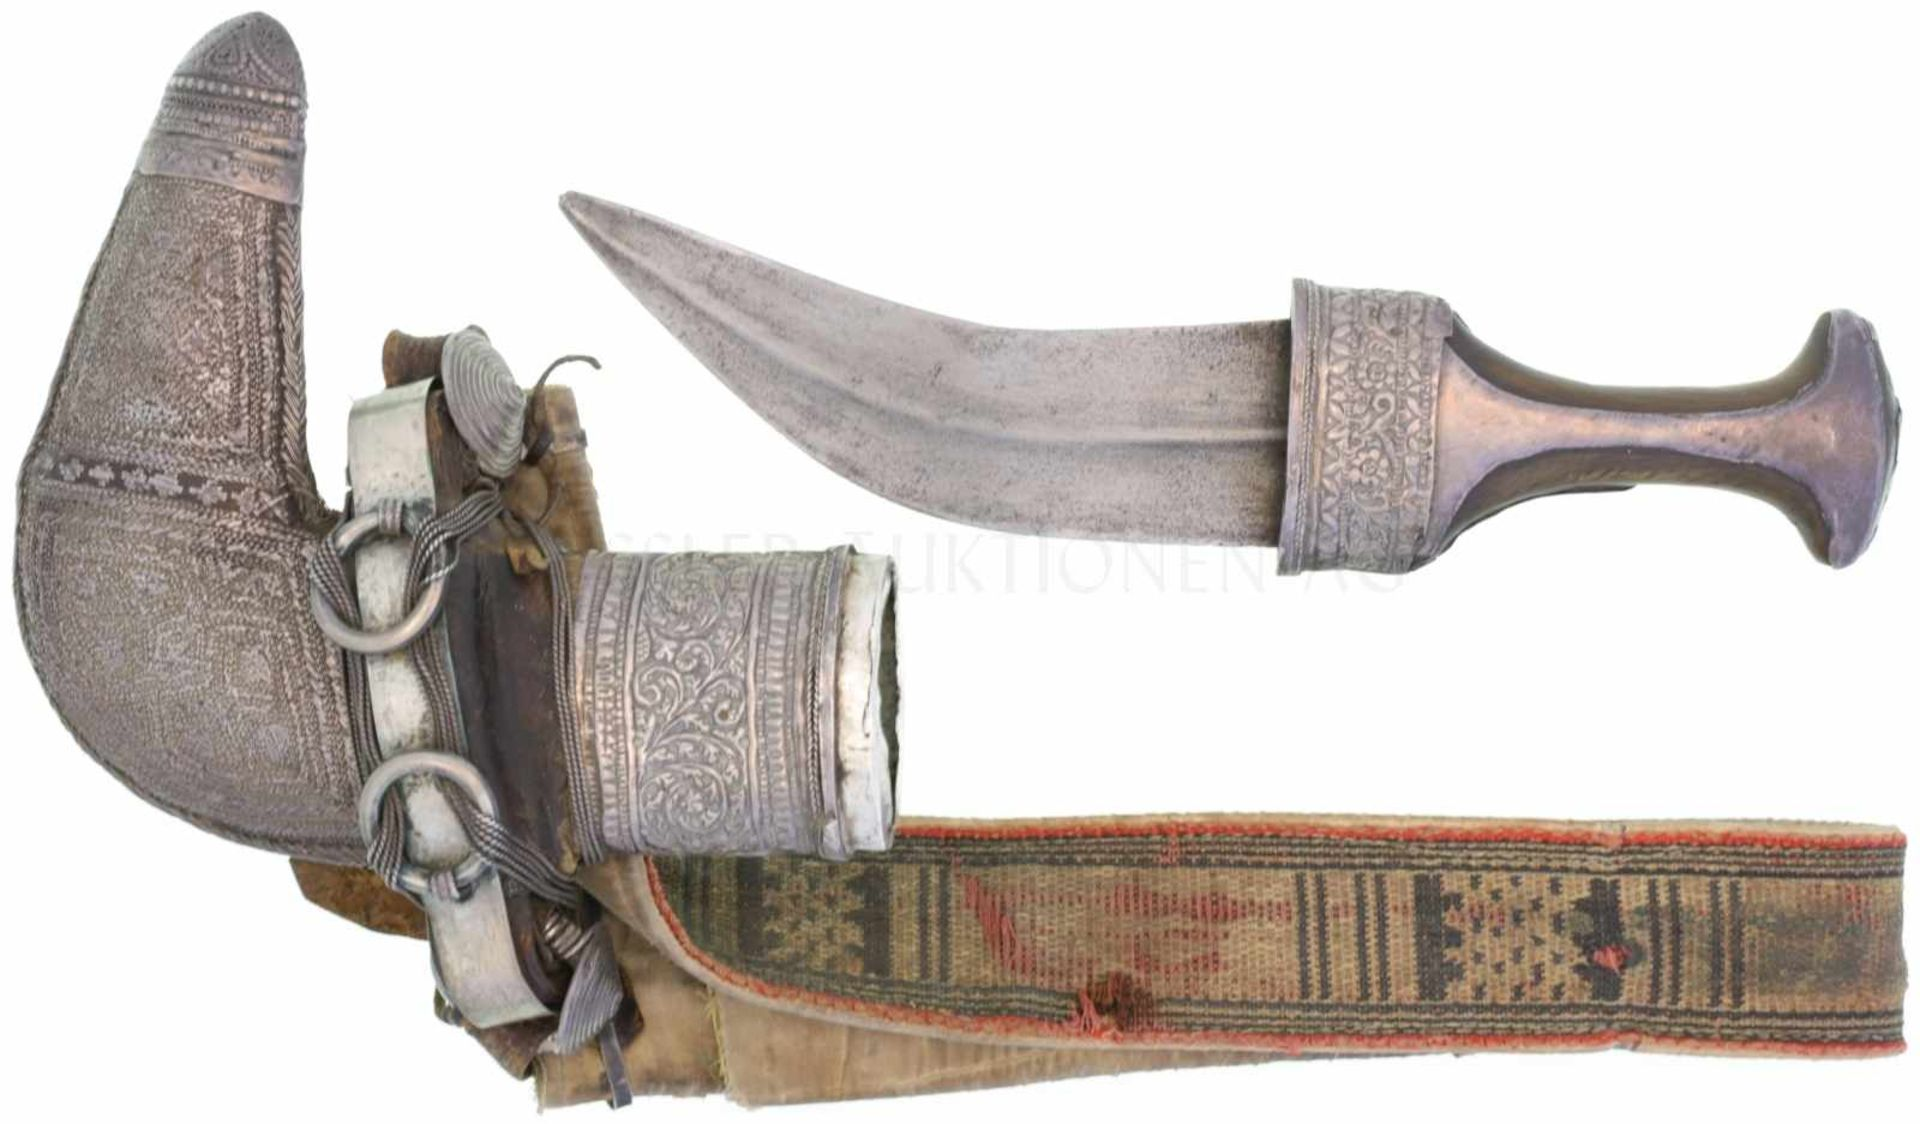 Jambiya Khanjar Oman um 1860 KL 180mm, TL 300mm, gekrümmte breite Klinge mit Mittelgrat. Silberne